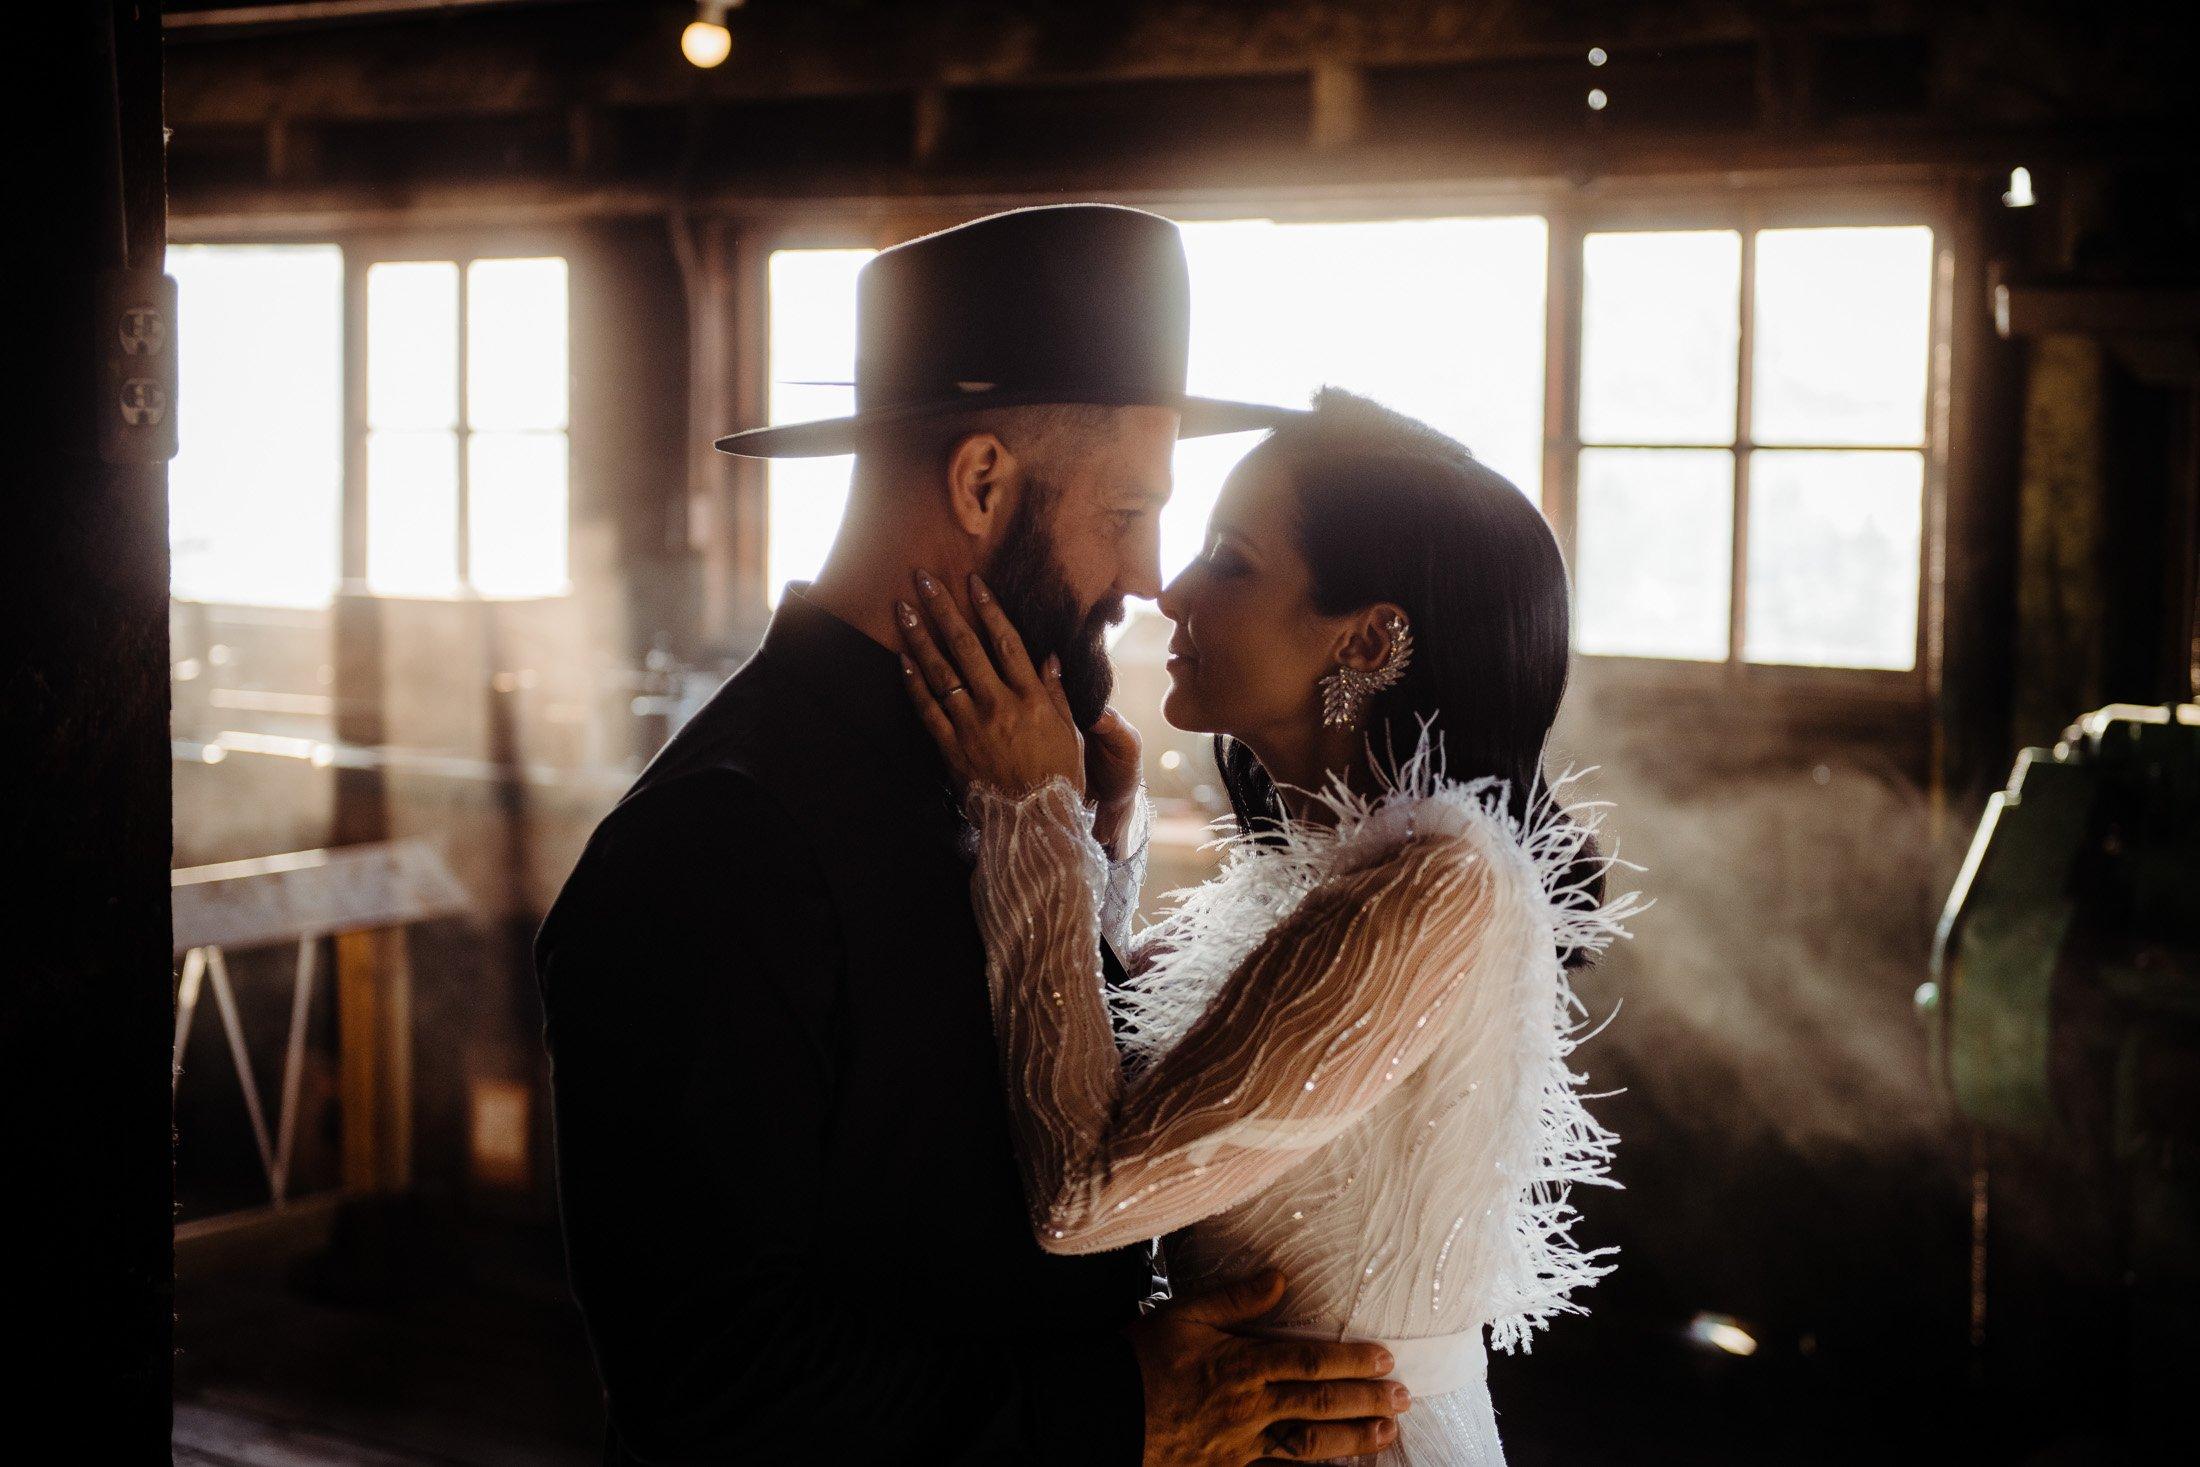 018 - cowboy hat wedding photo